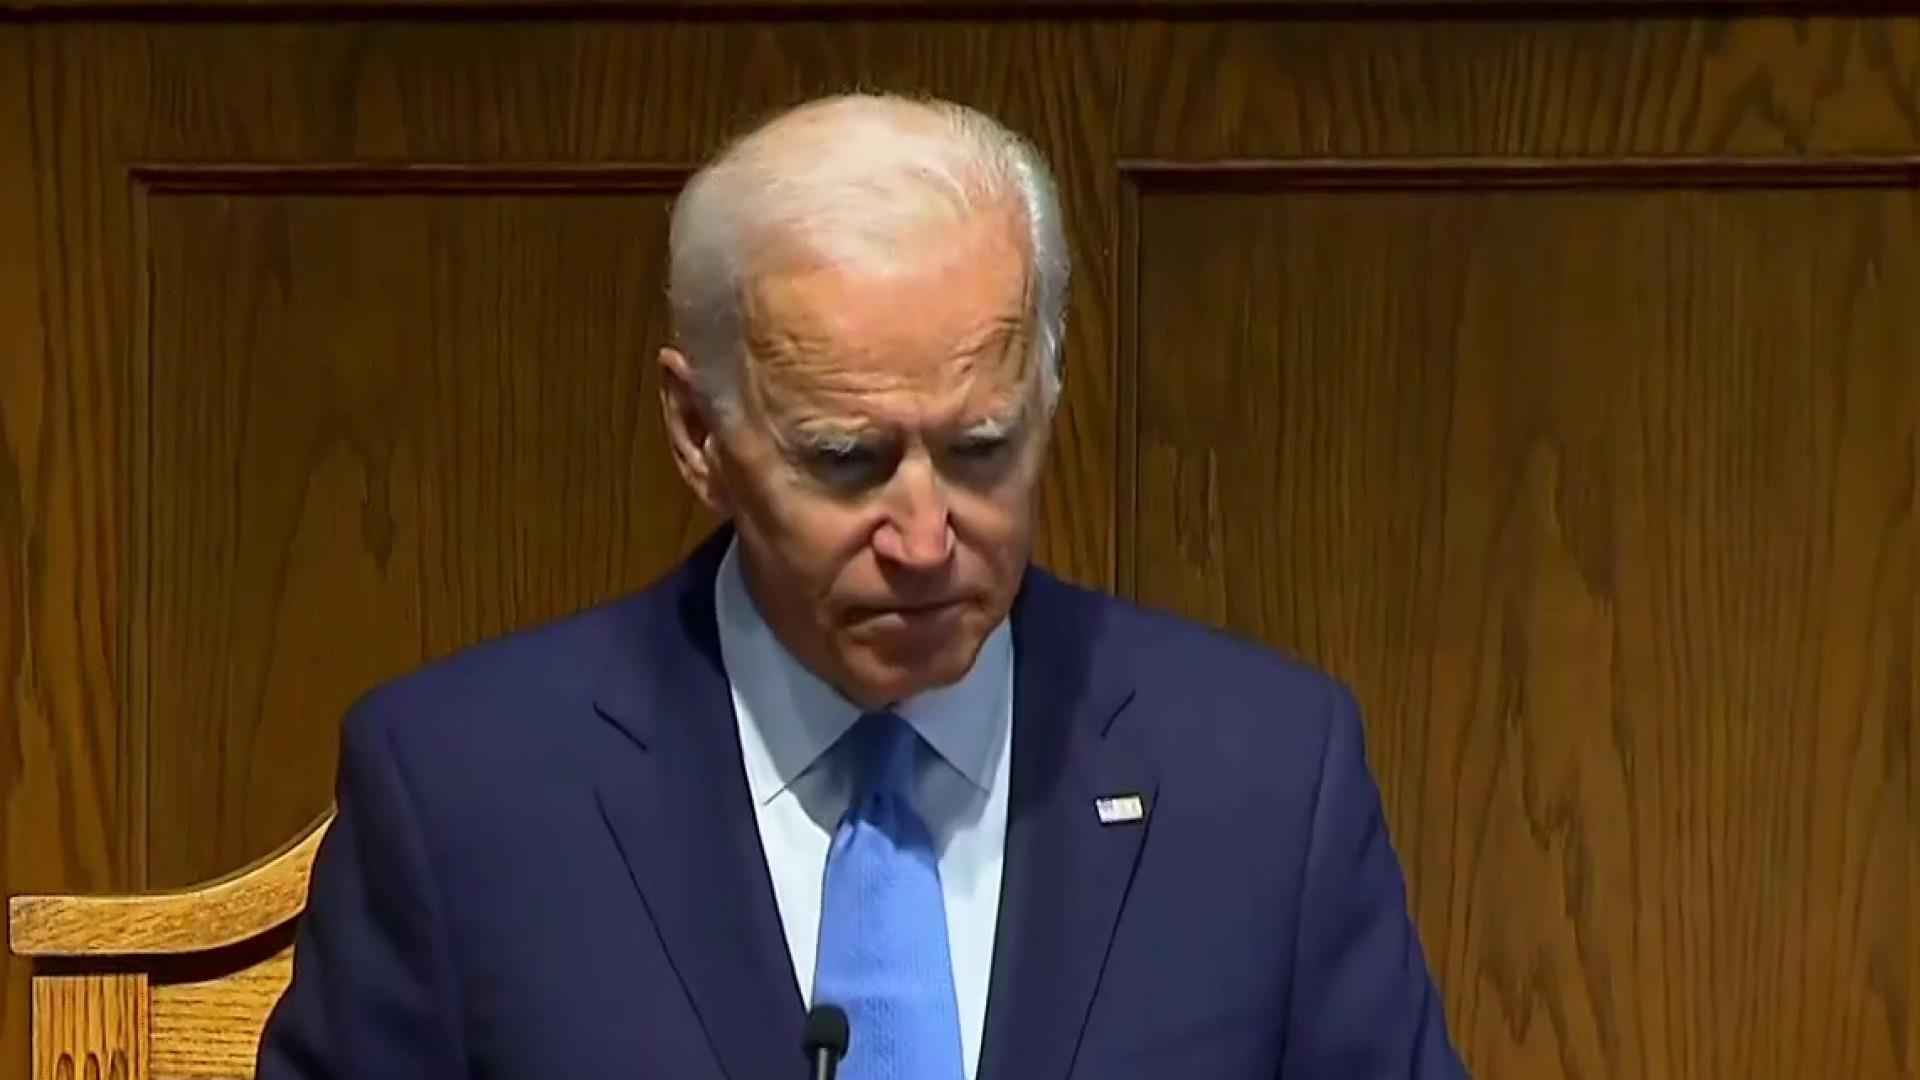 Biden gives powerful speech remembering Birmingham church bombing